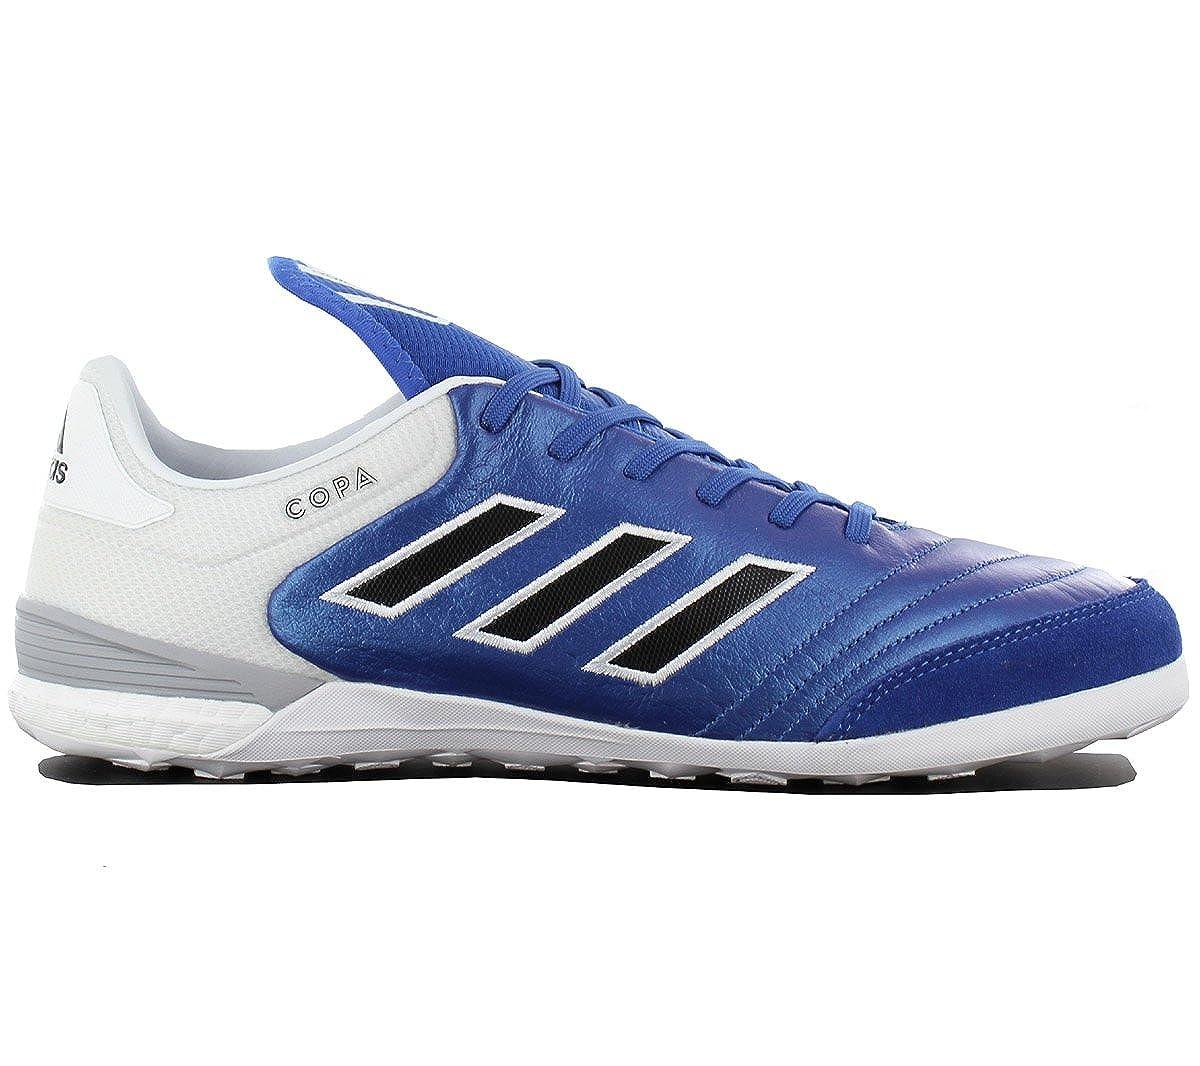 Adidas Herren Copa Tango 17.1 In für Fußballtrainingsschuhe, Blau (Blu Azul Negbas ftwbla), 40 EU